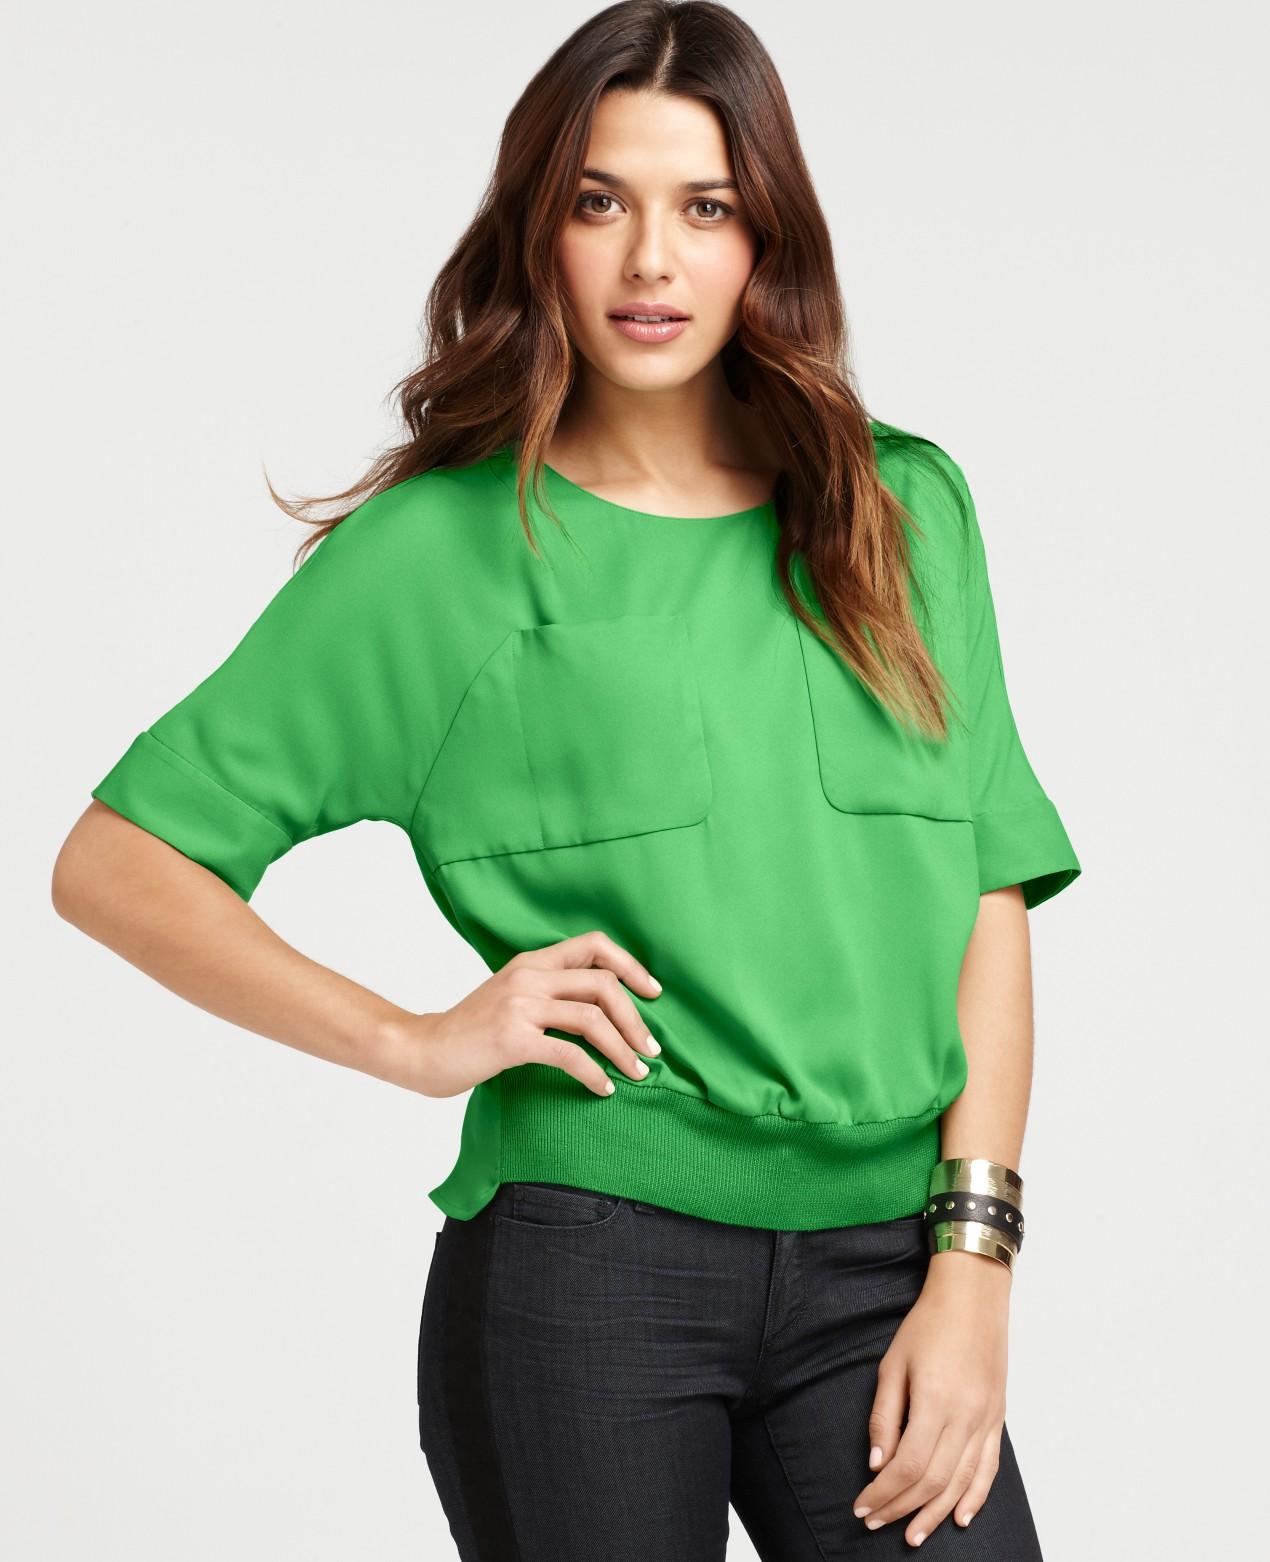 Women S Striped Shirt